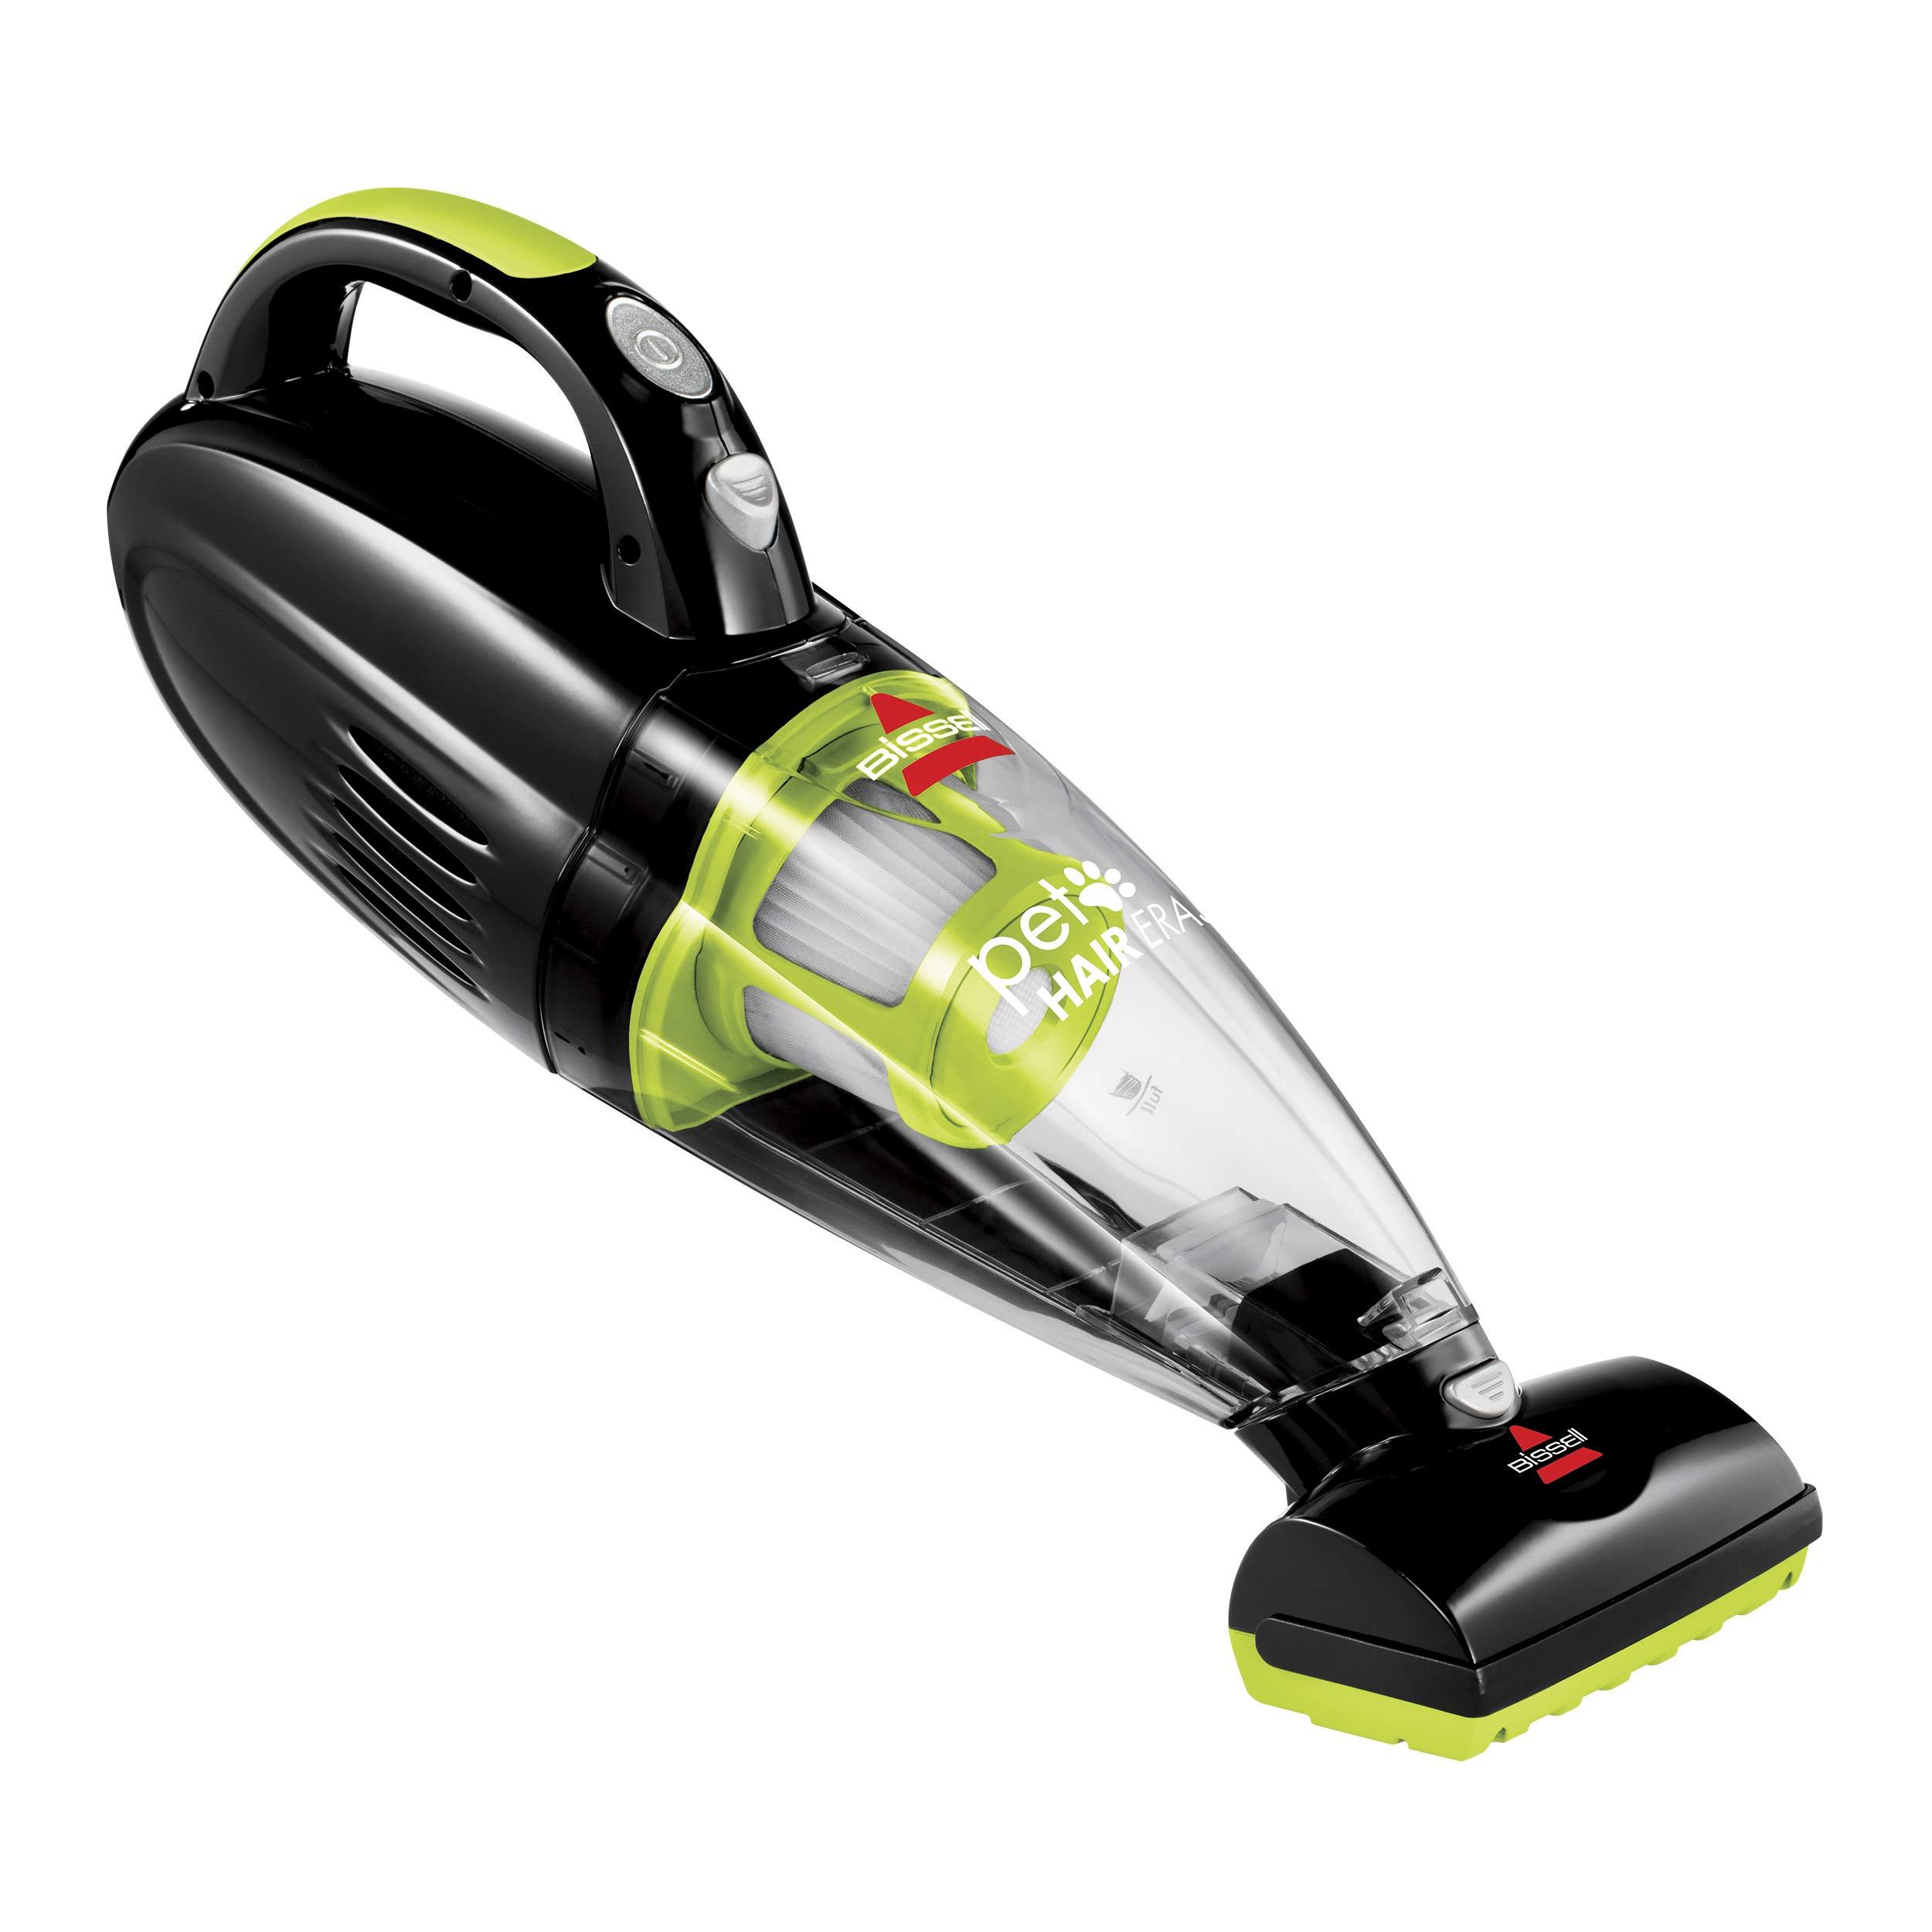 Bissell 1782 Eraser Cordless Vacuum